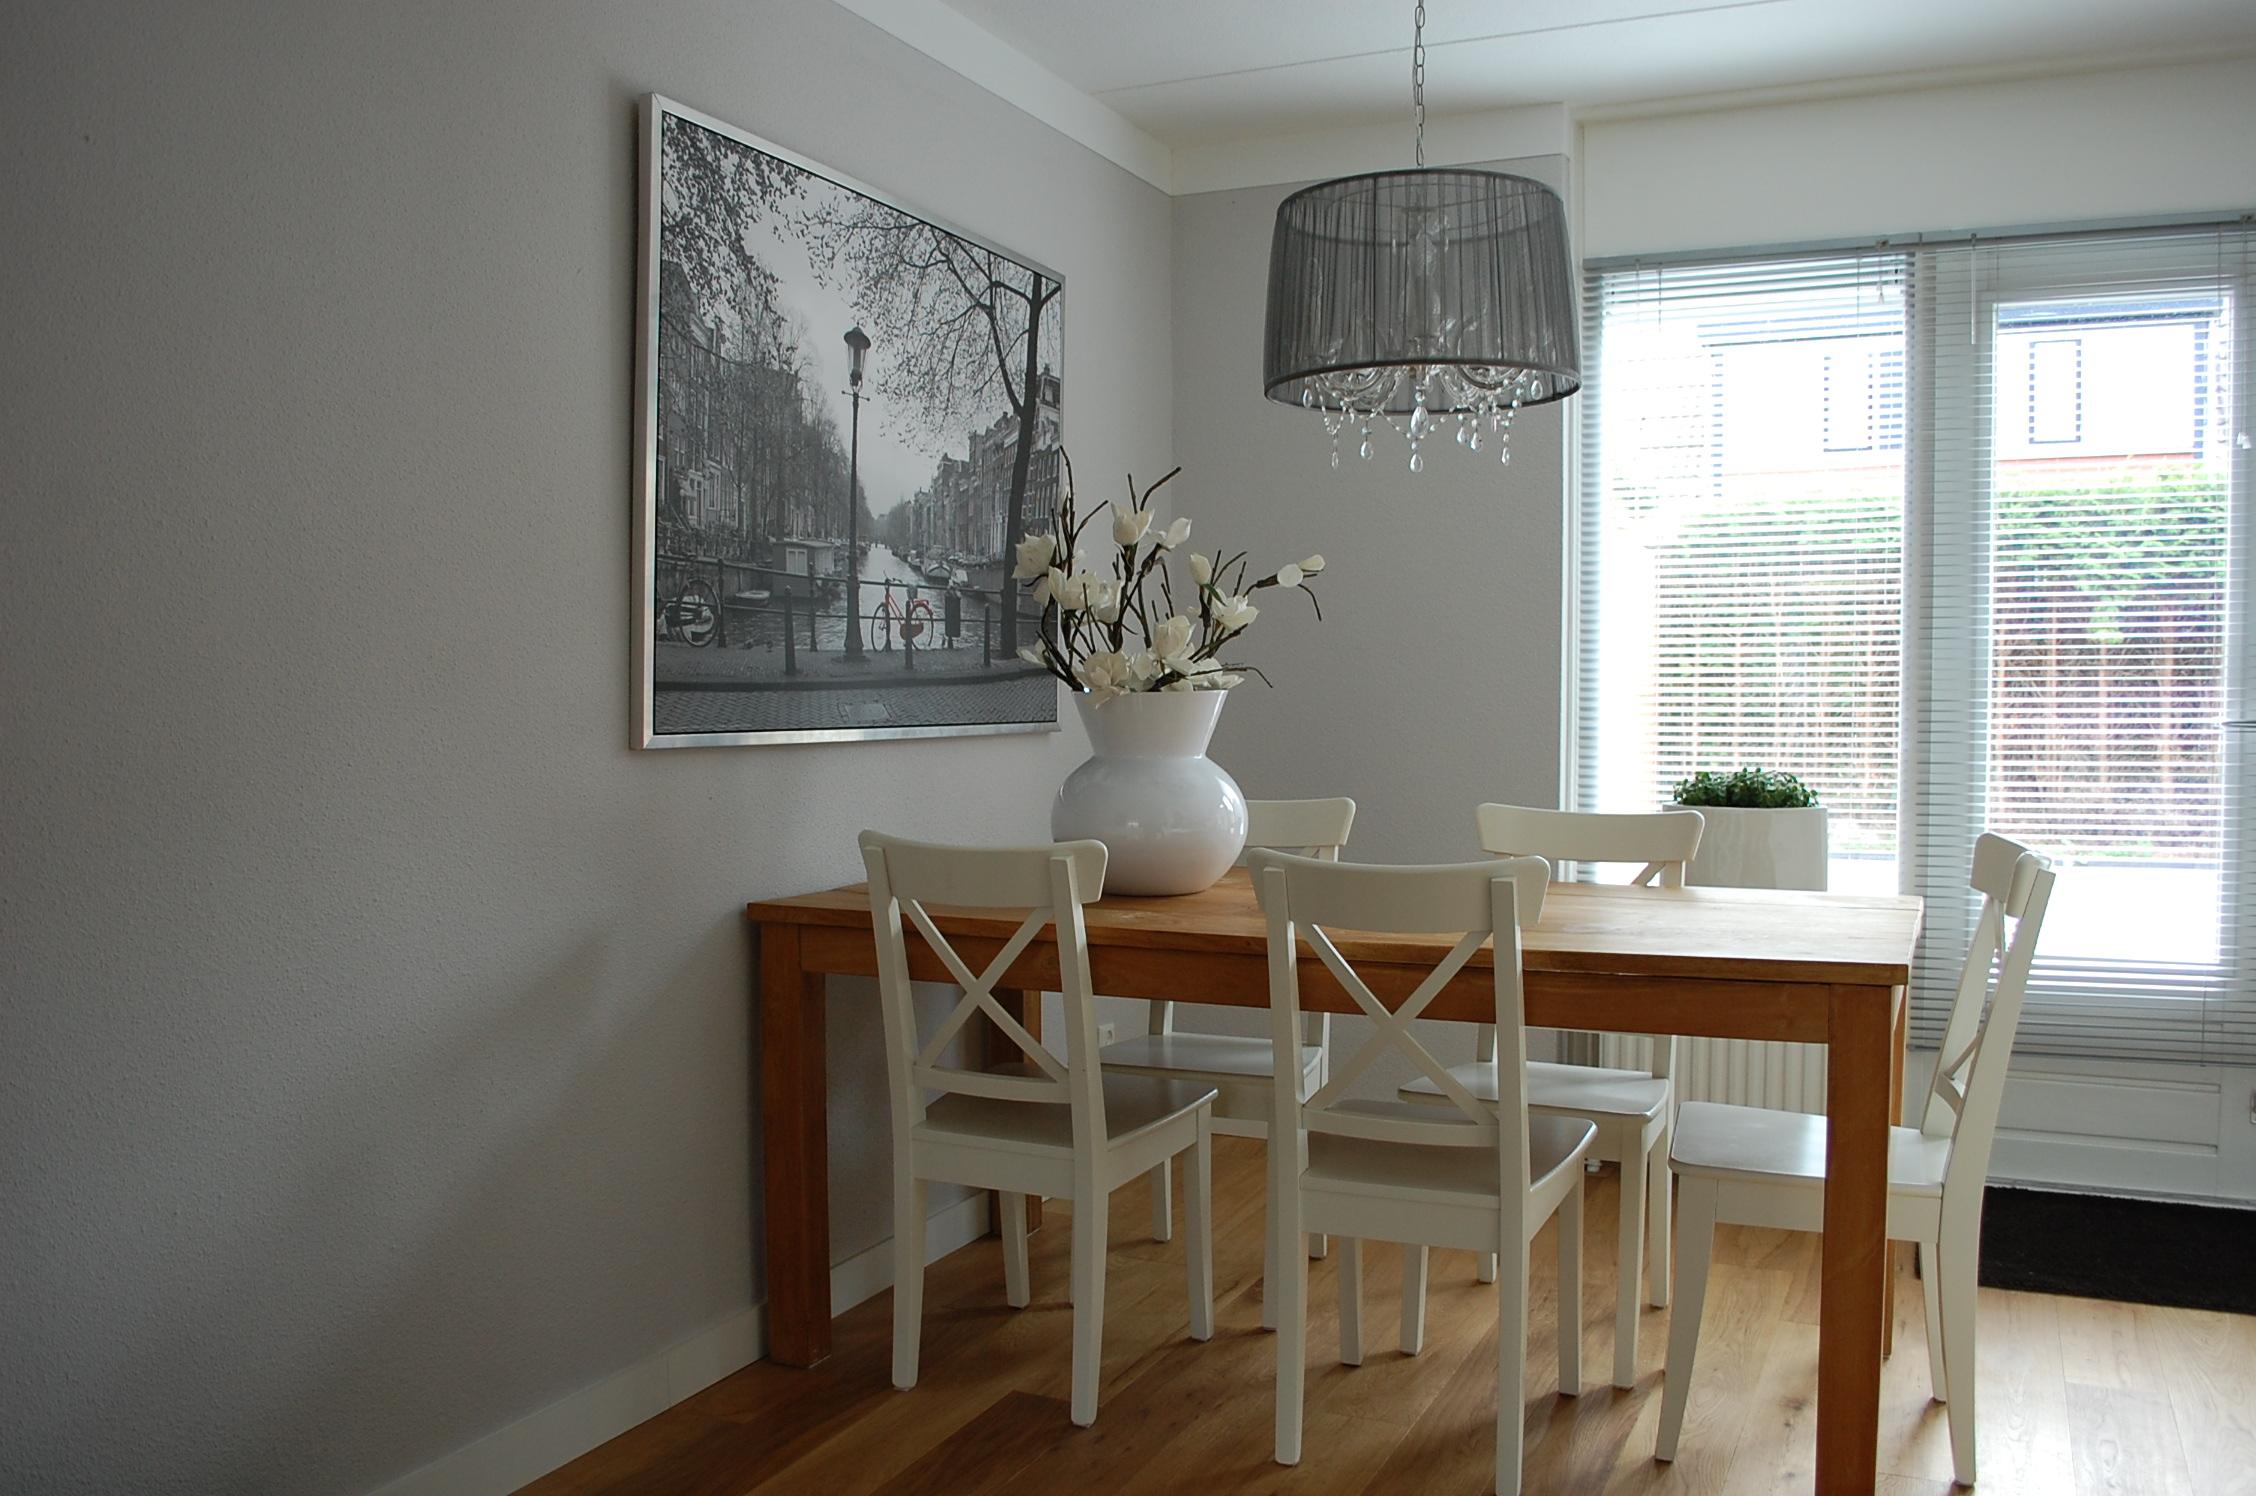 Witte keuken idee - Keuken muur kleur idee ...